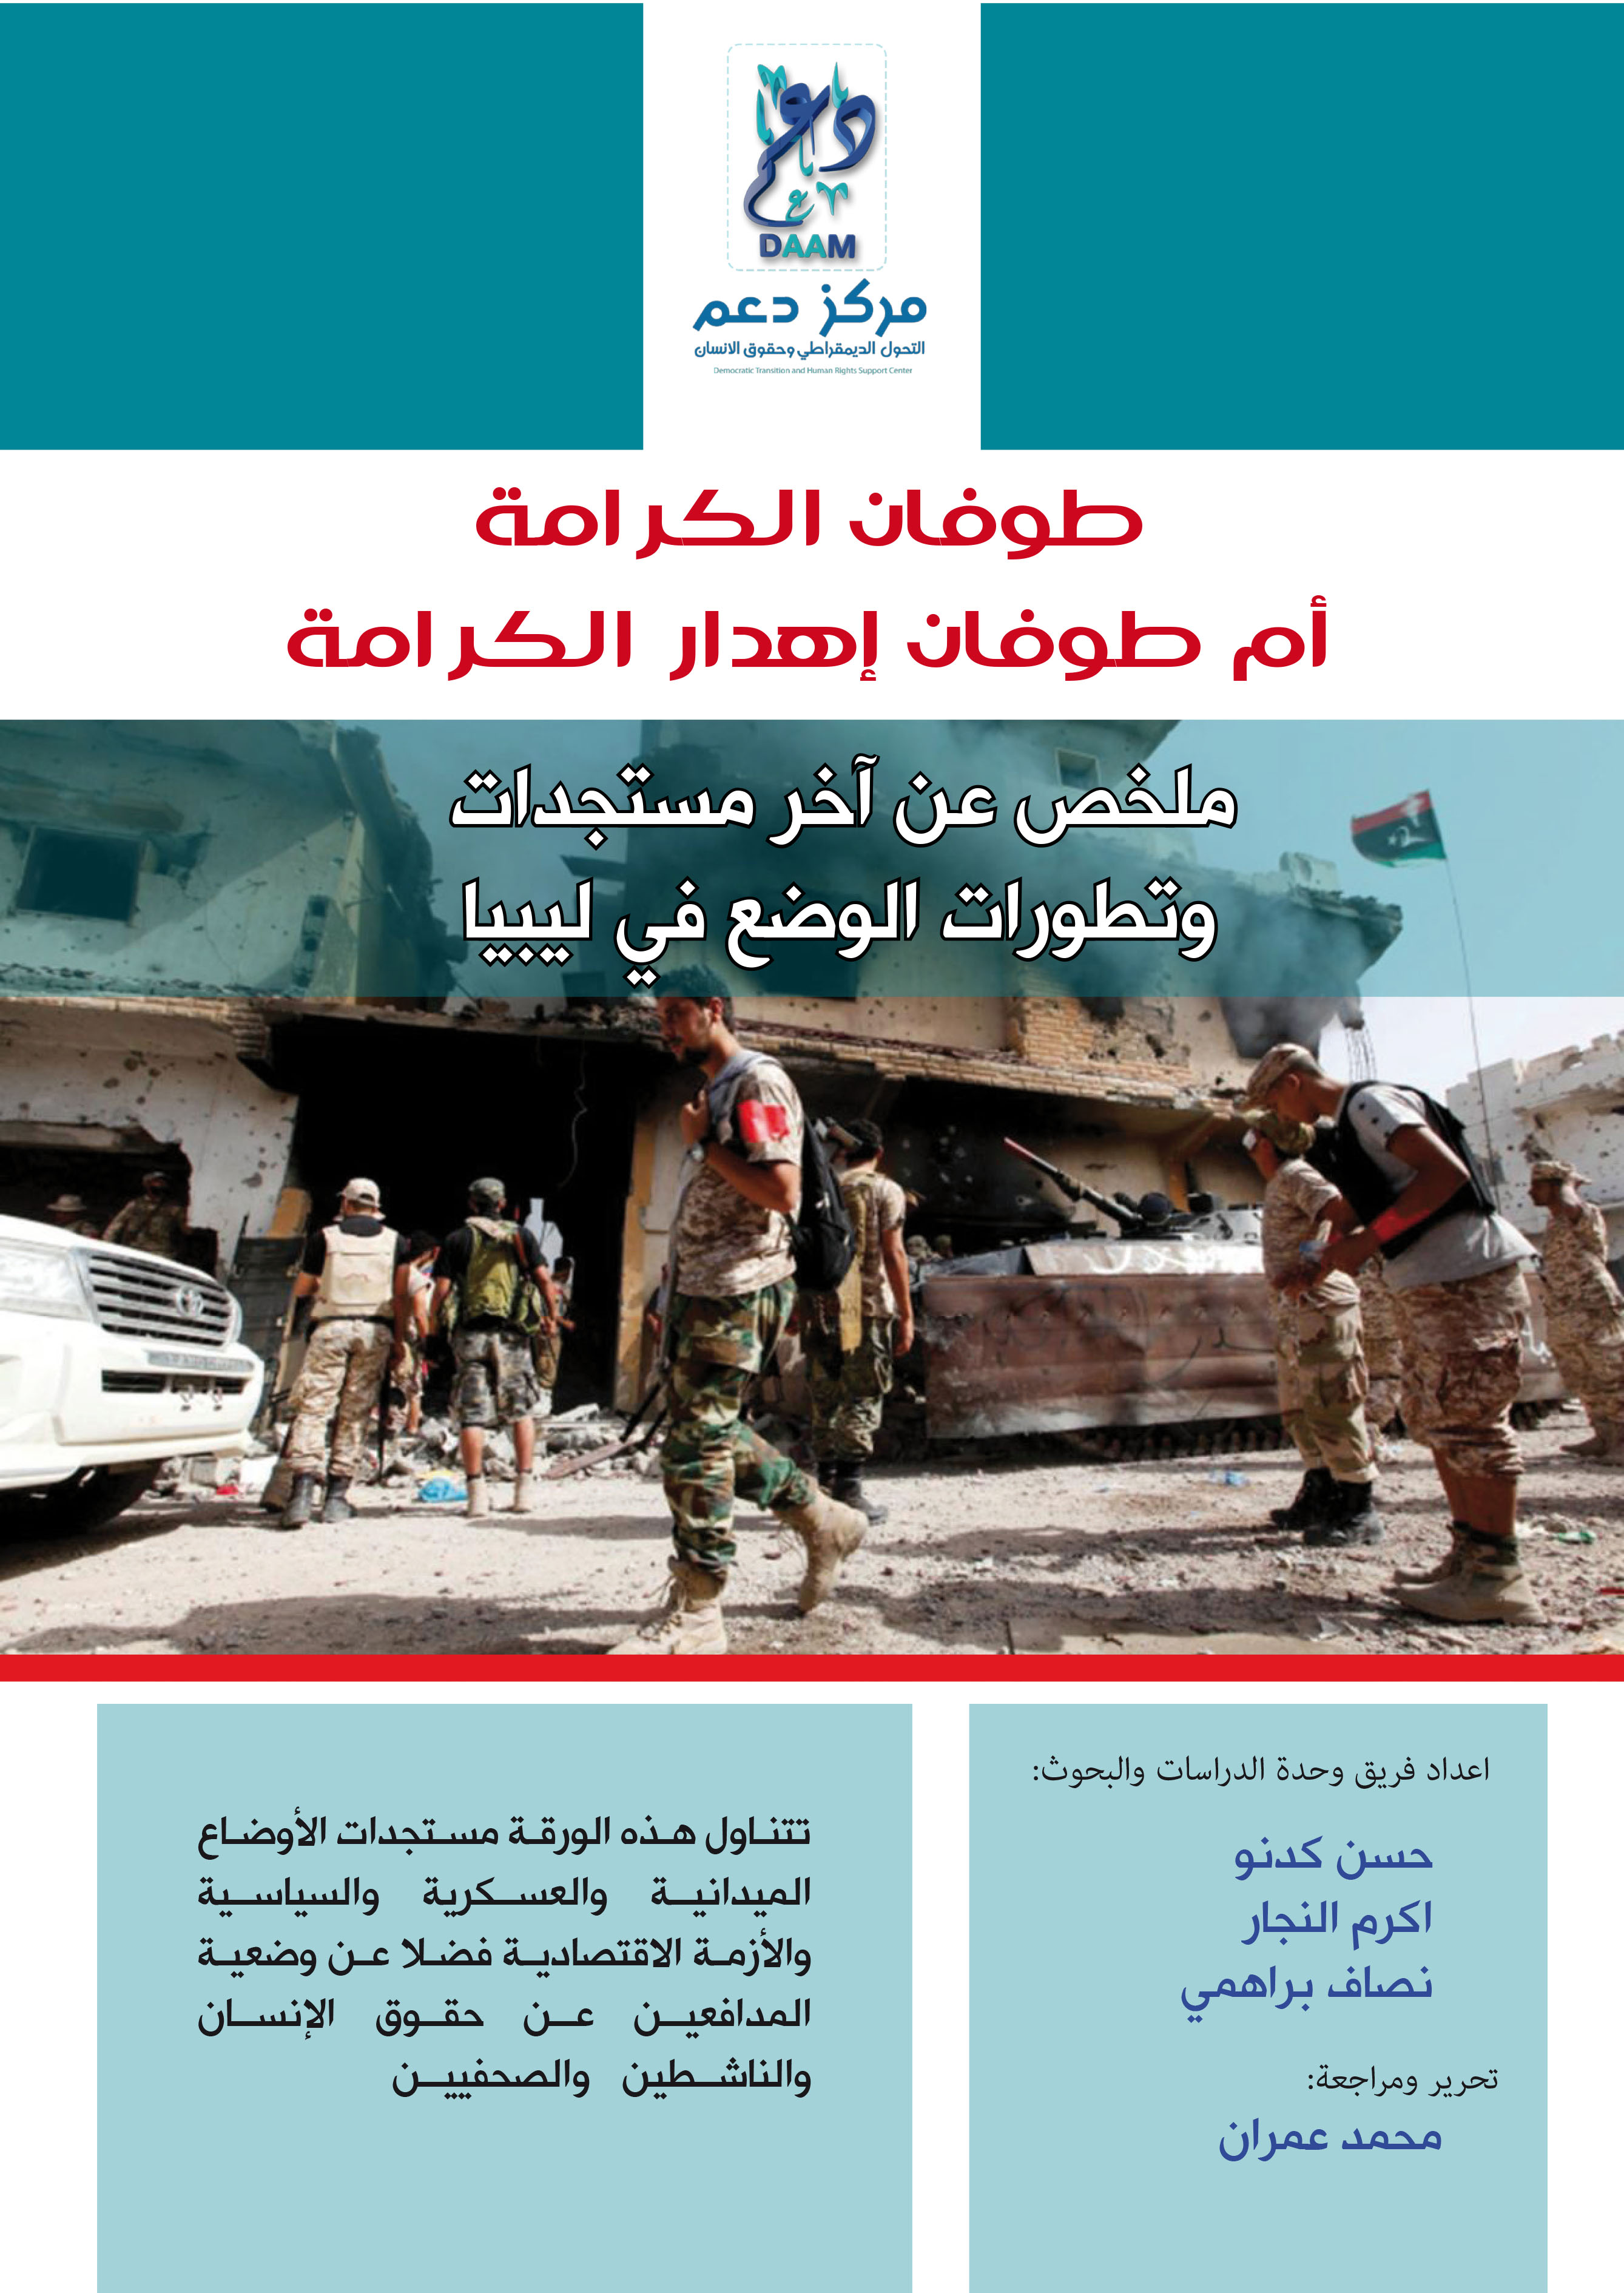 Photo of طوفان الكرامة أم طوفان إهدار الكرامة مُلخص عن آخر مستجدات وتطورات الوضع في ليبيا